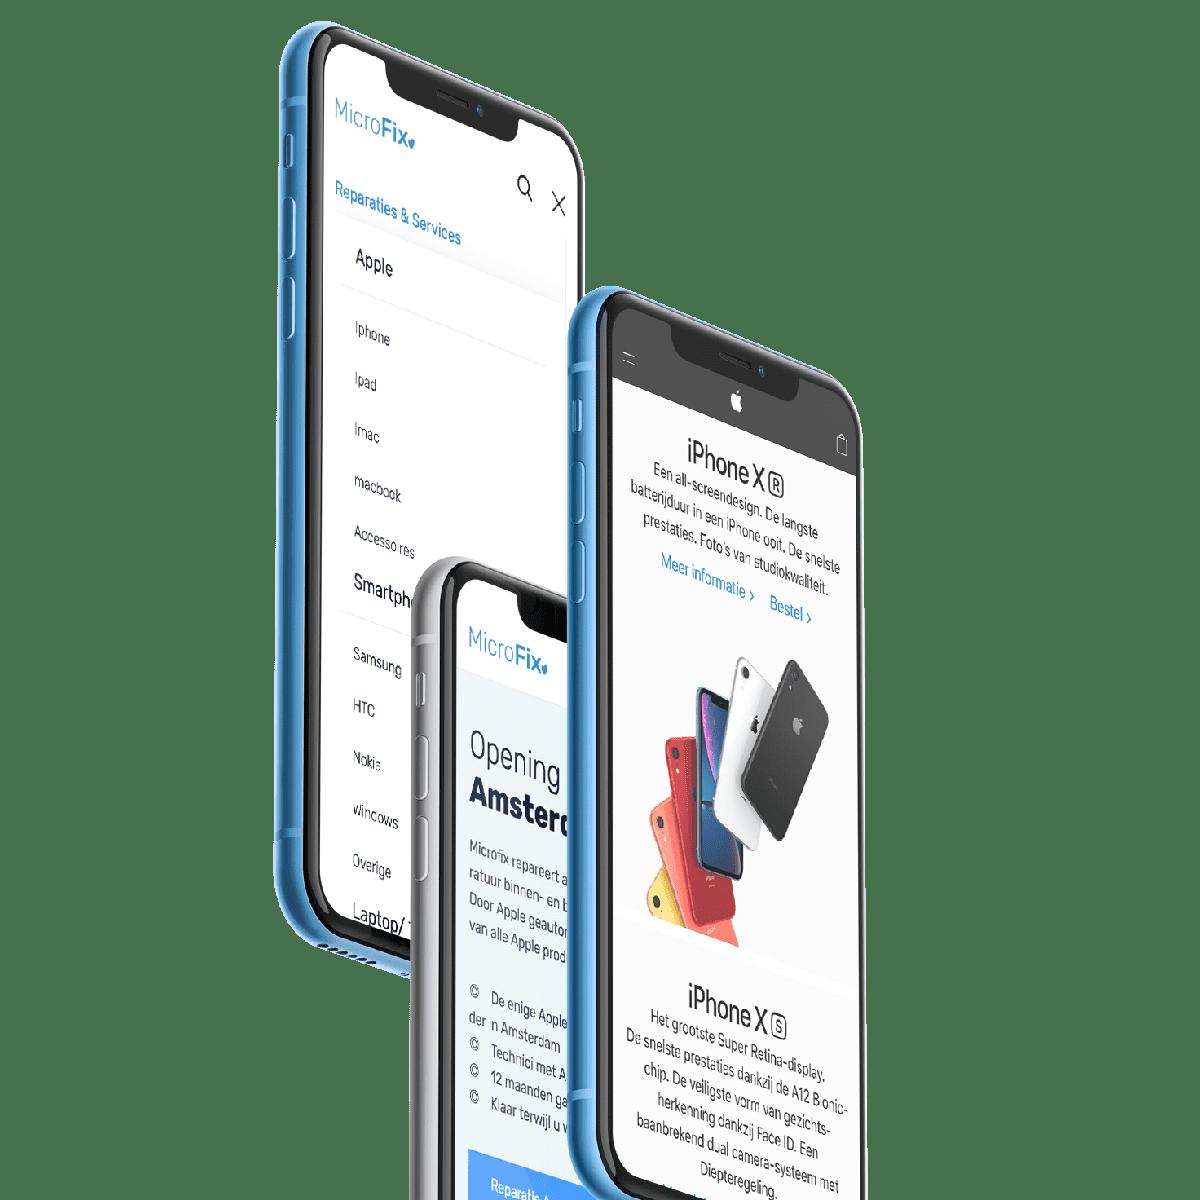 MicroFix Apple Authorised Service Provider